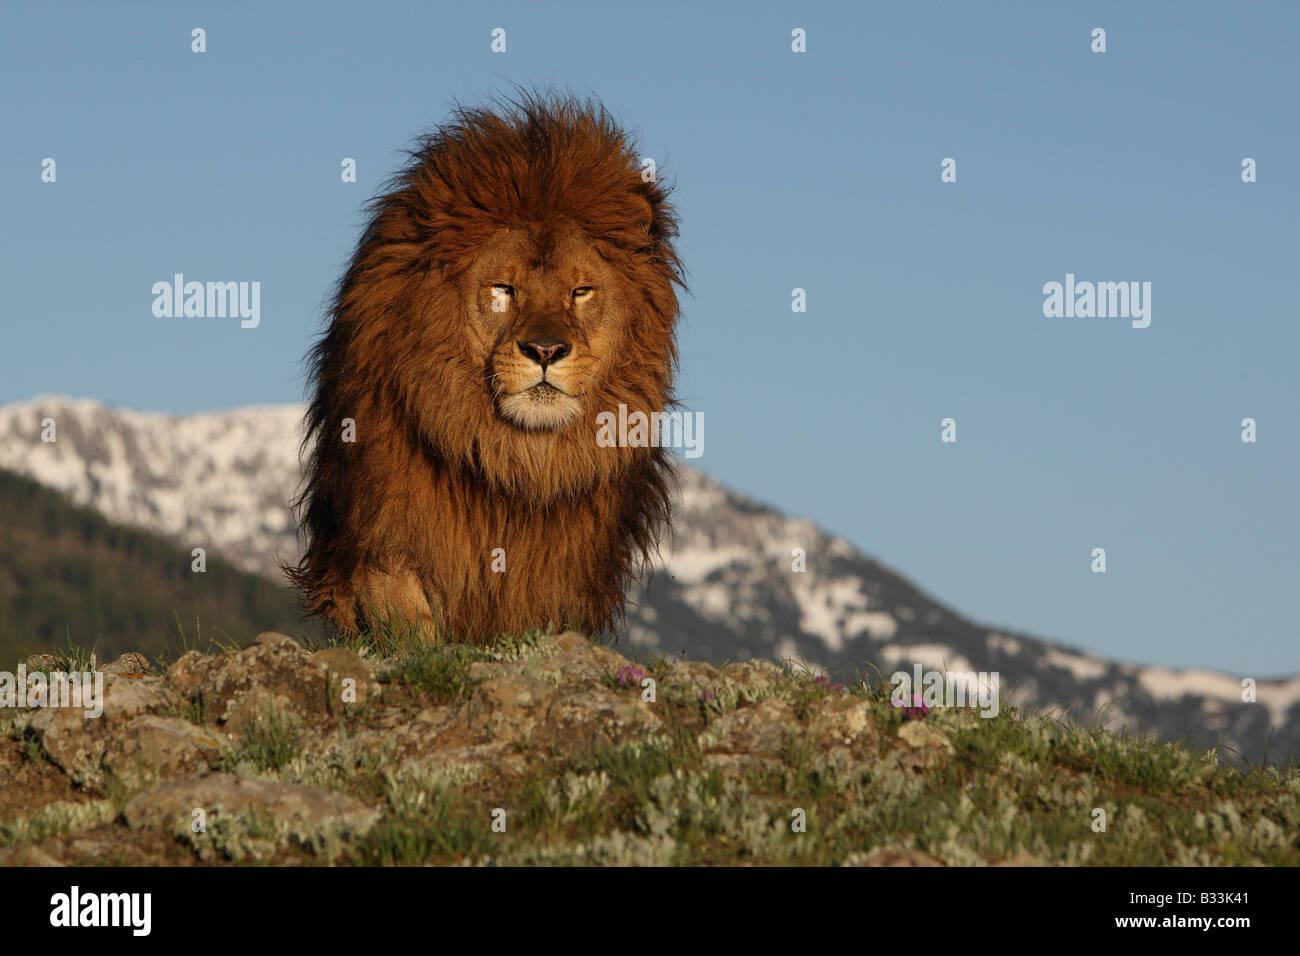 barbary lion - Stock Image